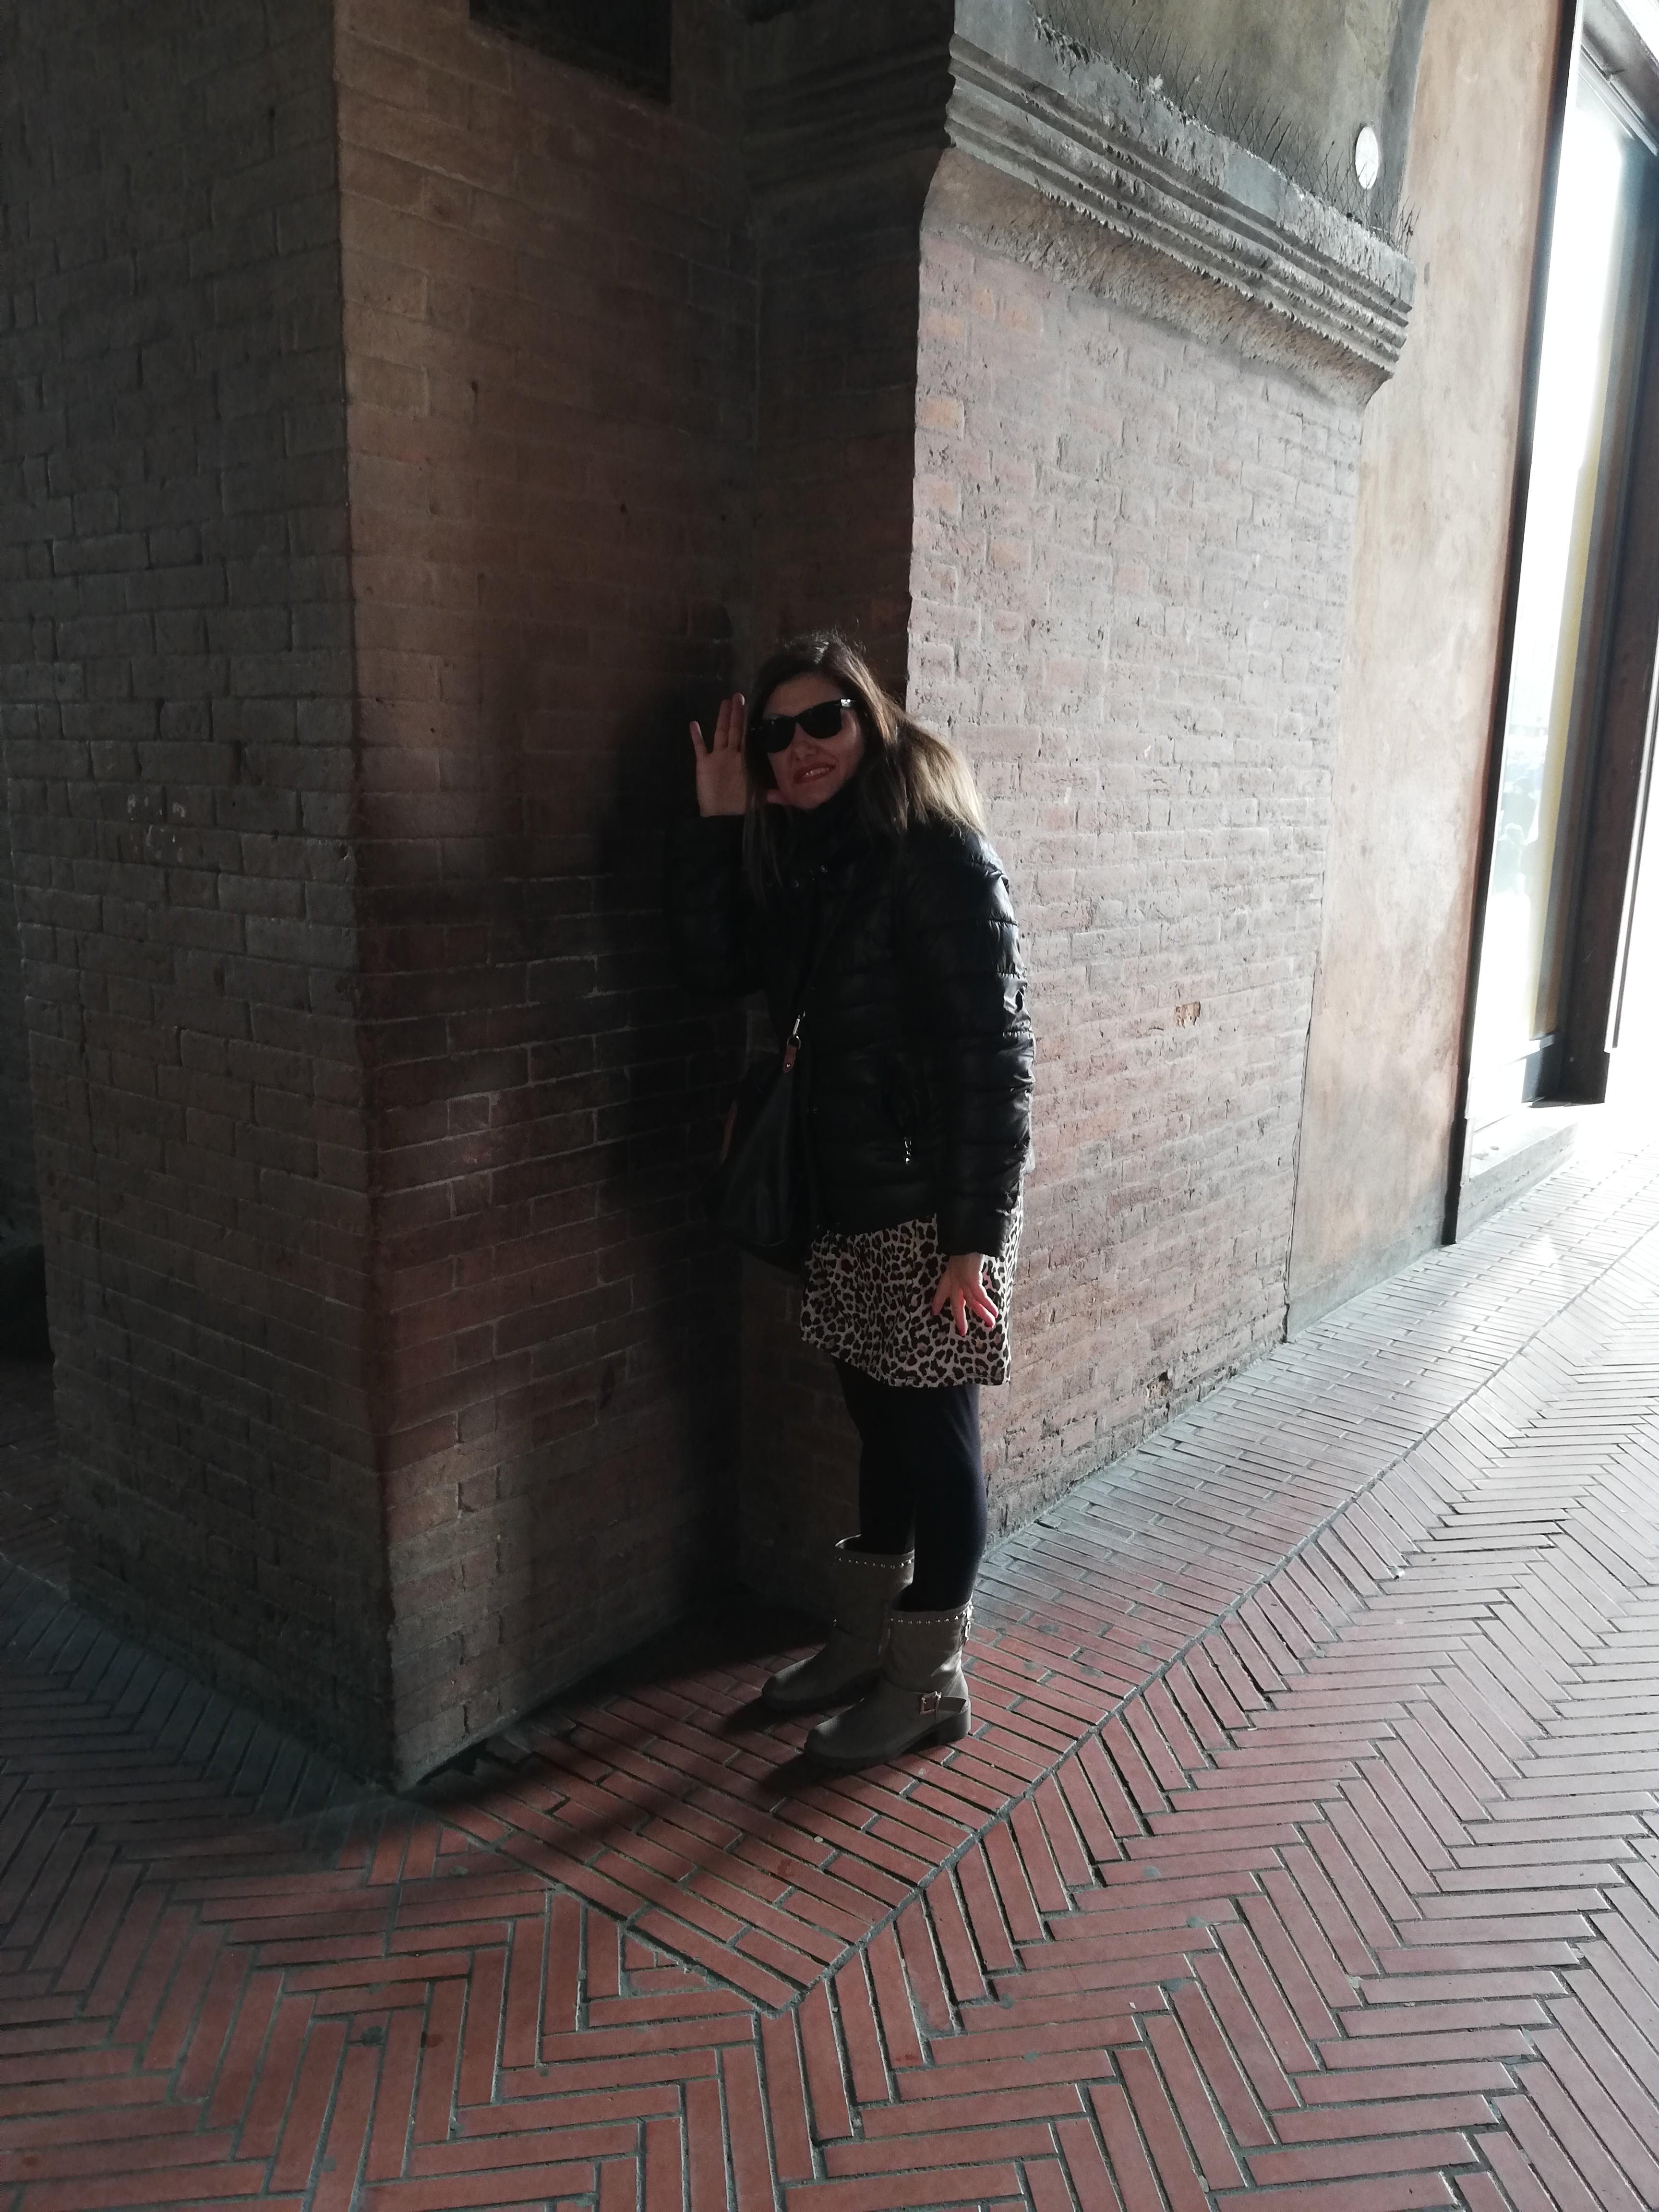 I segreti di Bologna: il telefono senza fili